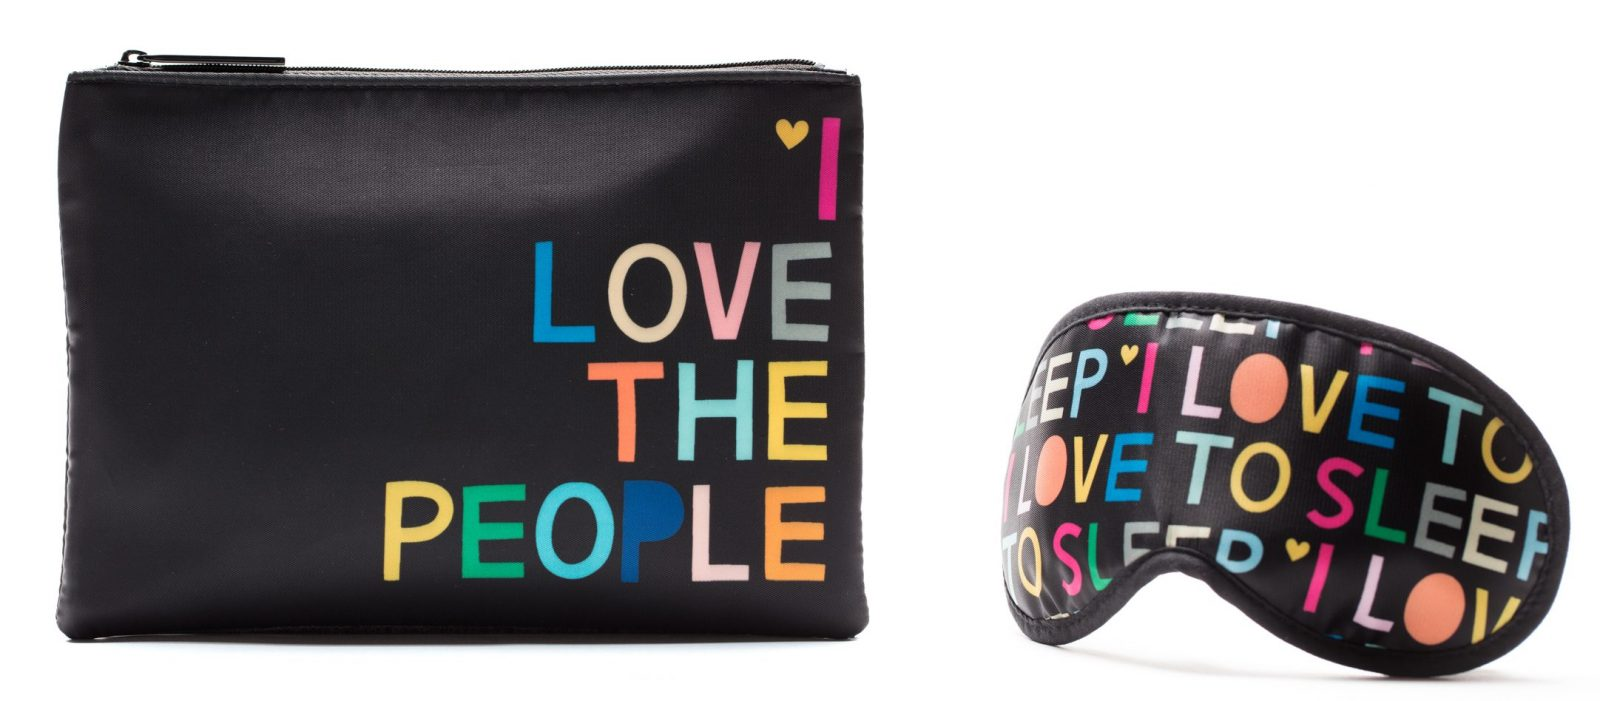 Qantas art Rachel Castle - I love the people